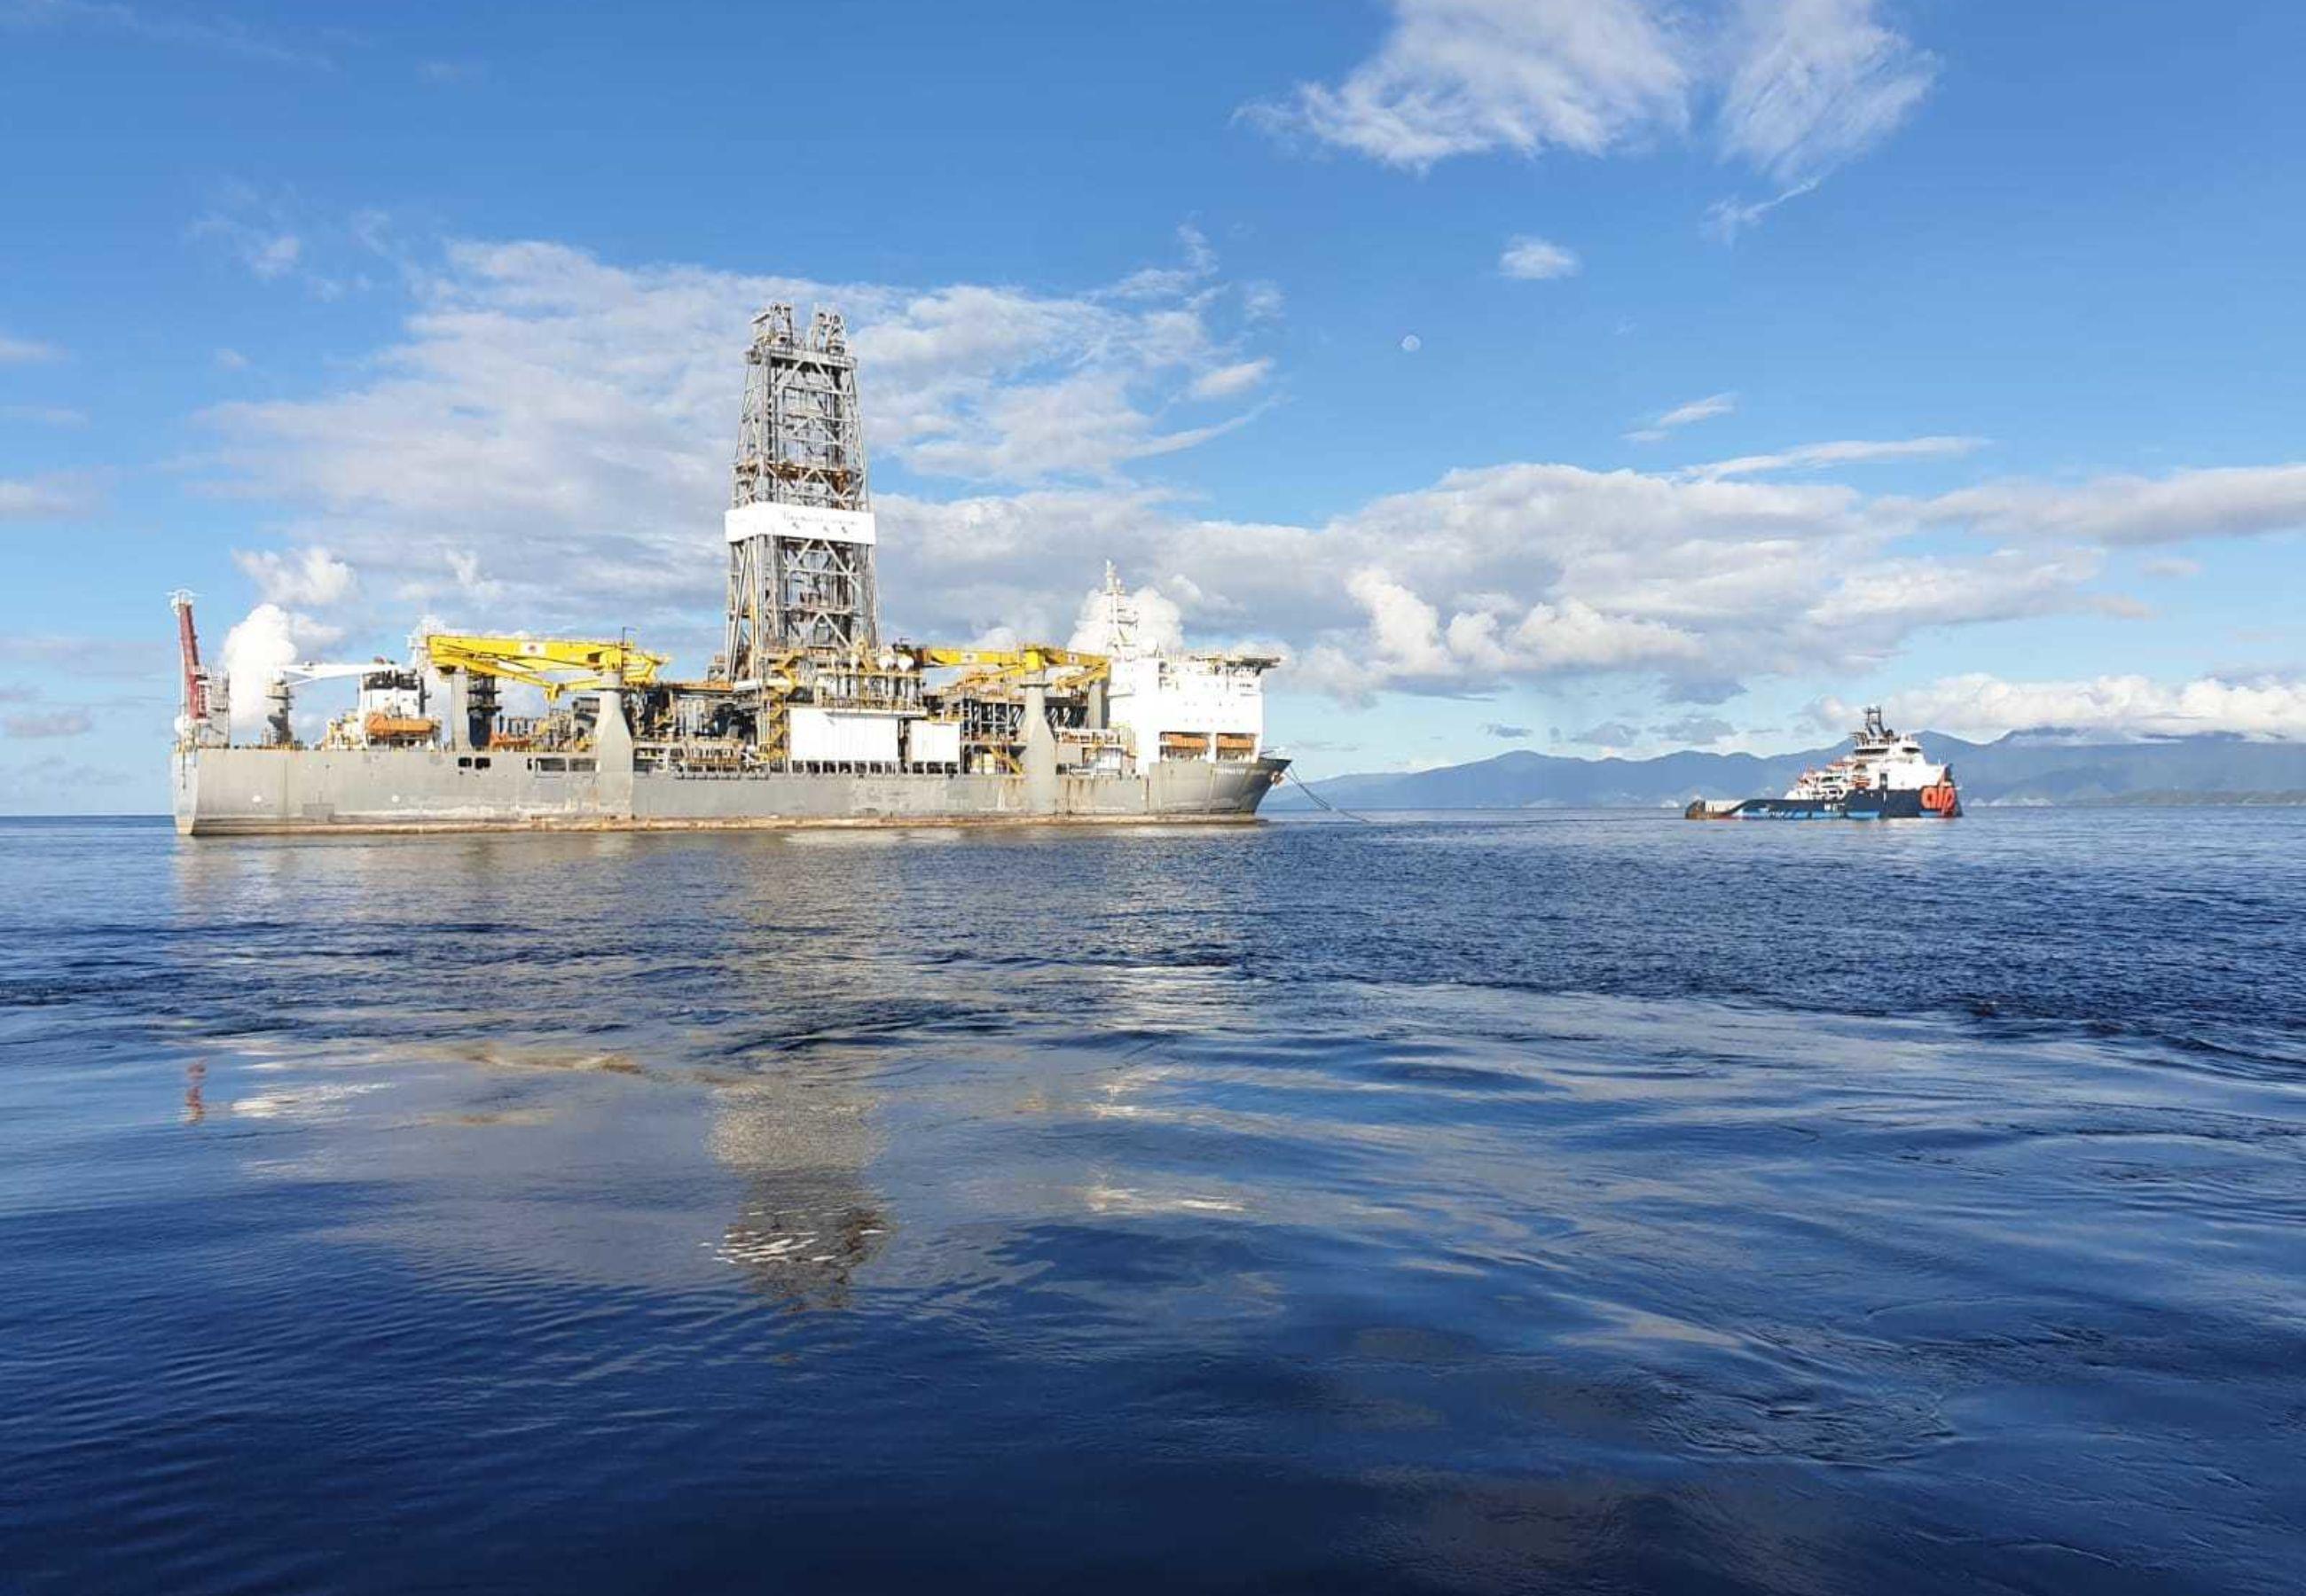 ALP Striker Deepwater Champion drillship towage NOV2019